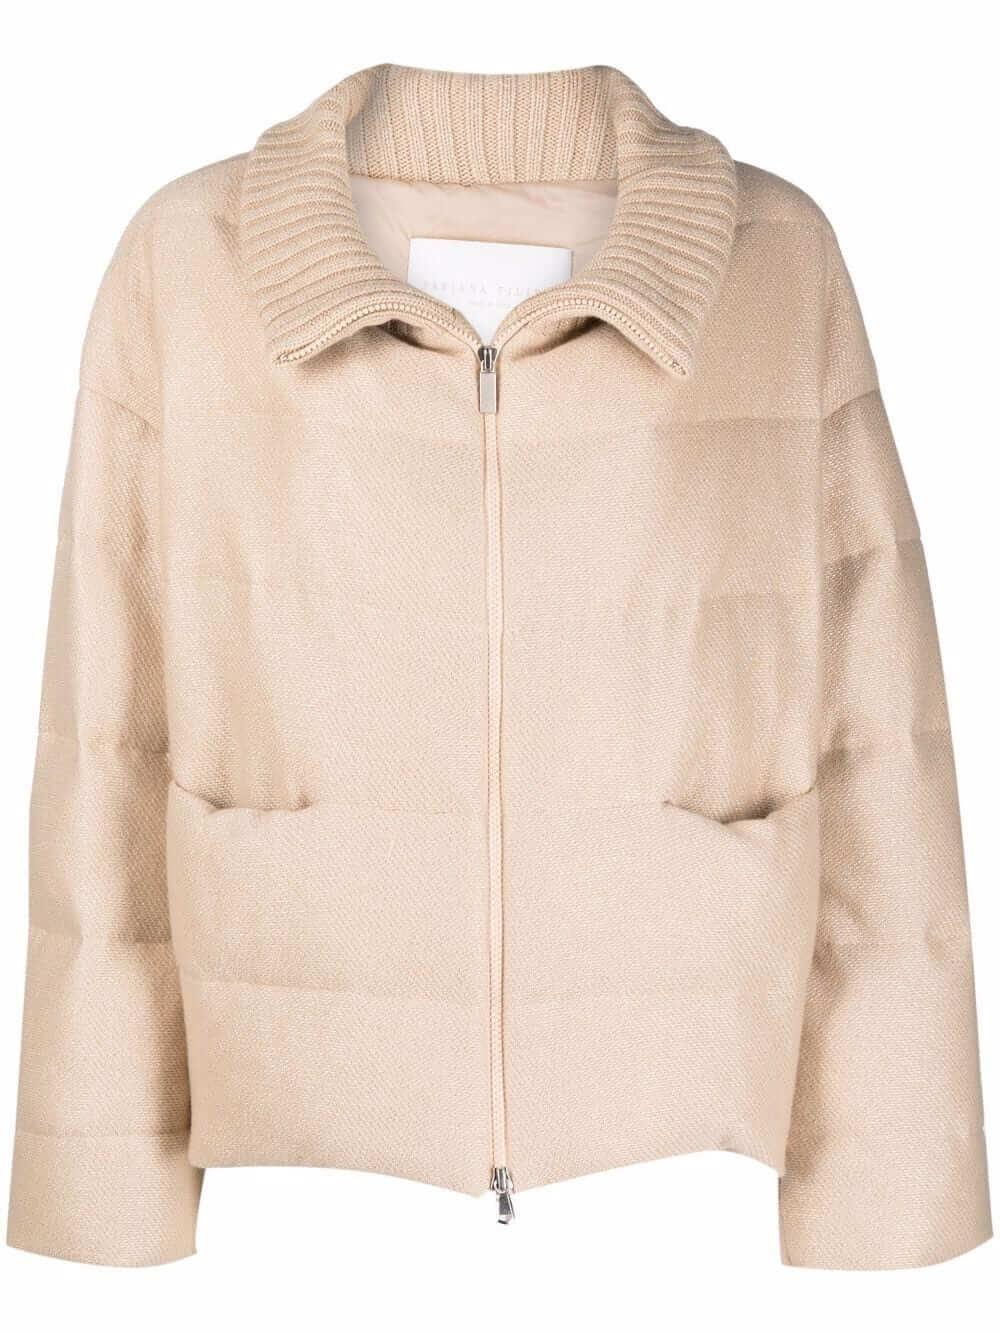 Zip- Up Puffer Jacket Item # CTD221W238